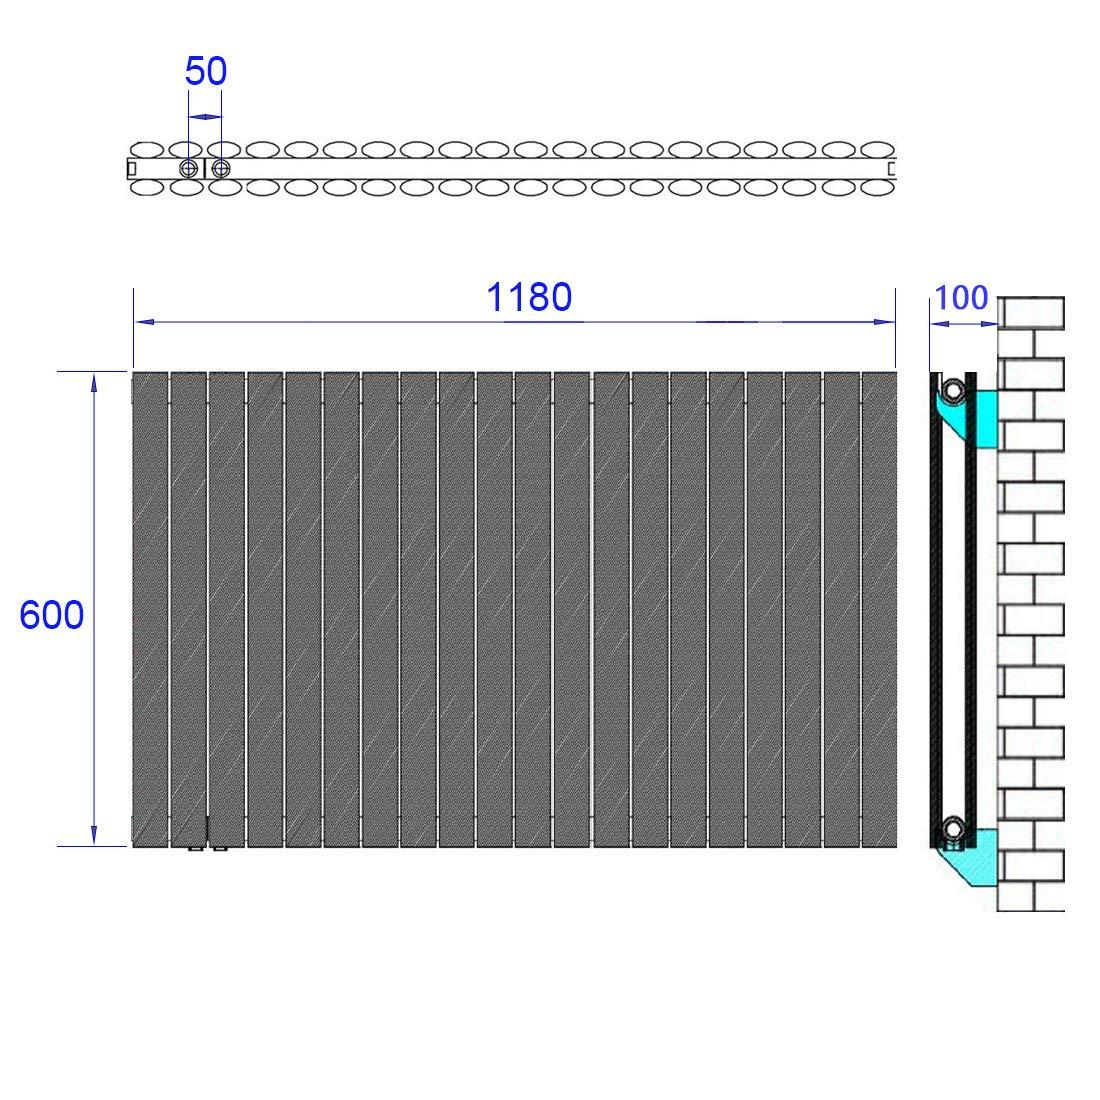 Design Oval Heizk/örper Vertikal Heizk/örper Antrazit 1800 x 480 mm Heizung Mittelanschluss Doppellagig